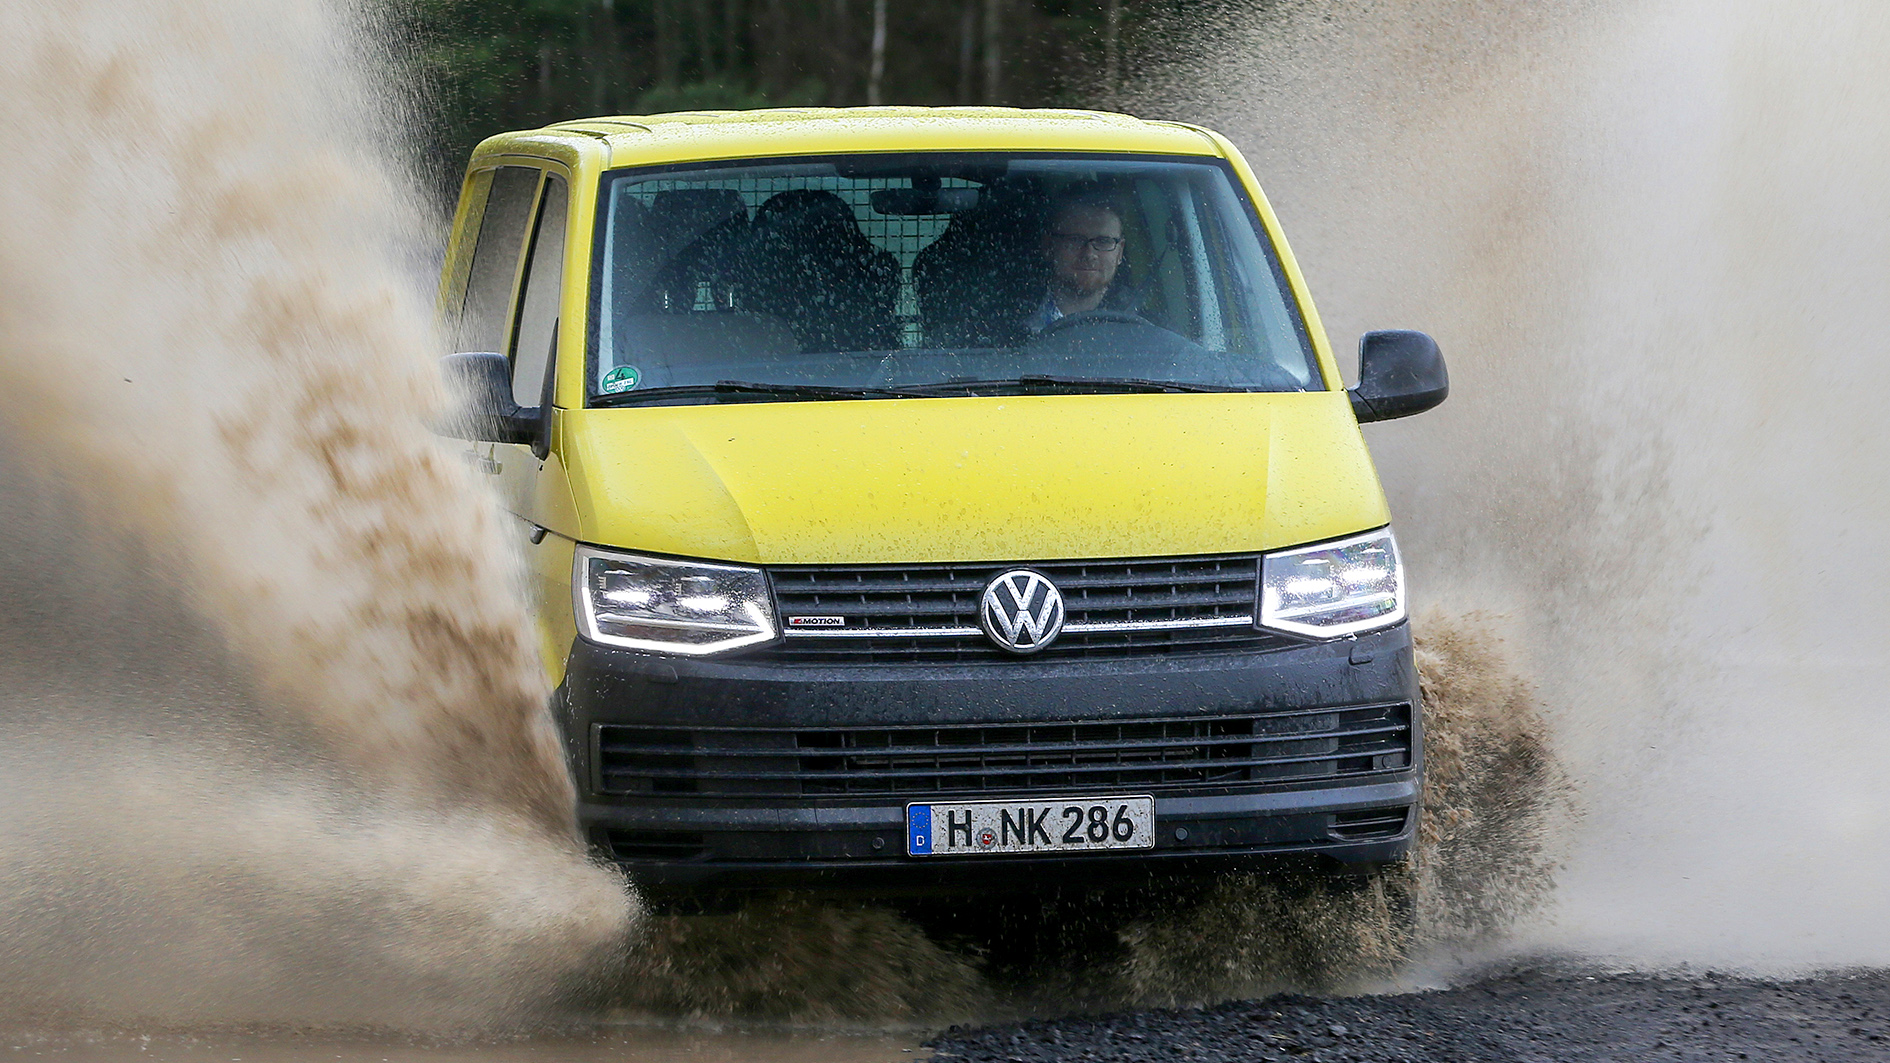 volkswagen nutzfahrzeuge off road amarok caddy t6. Black Bedroom Furniture Sets. Home Design Ideas